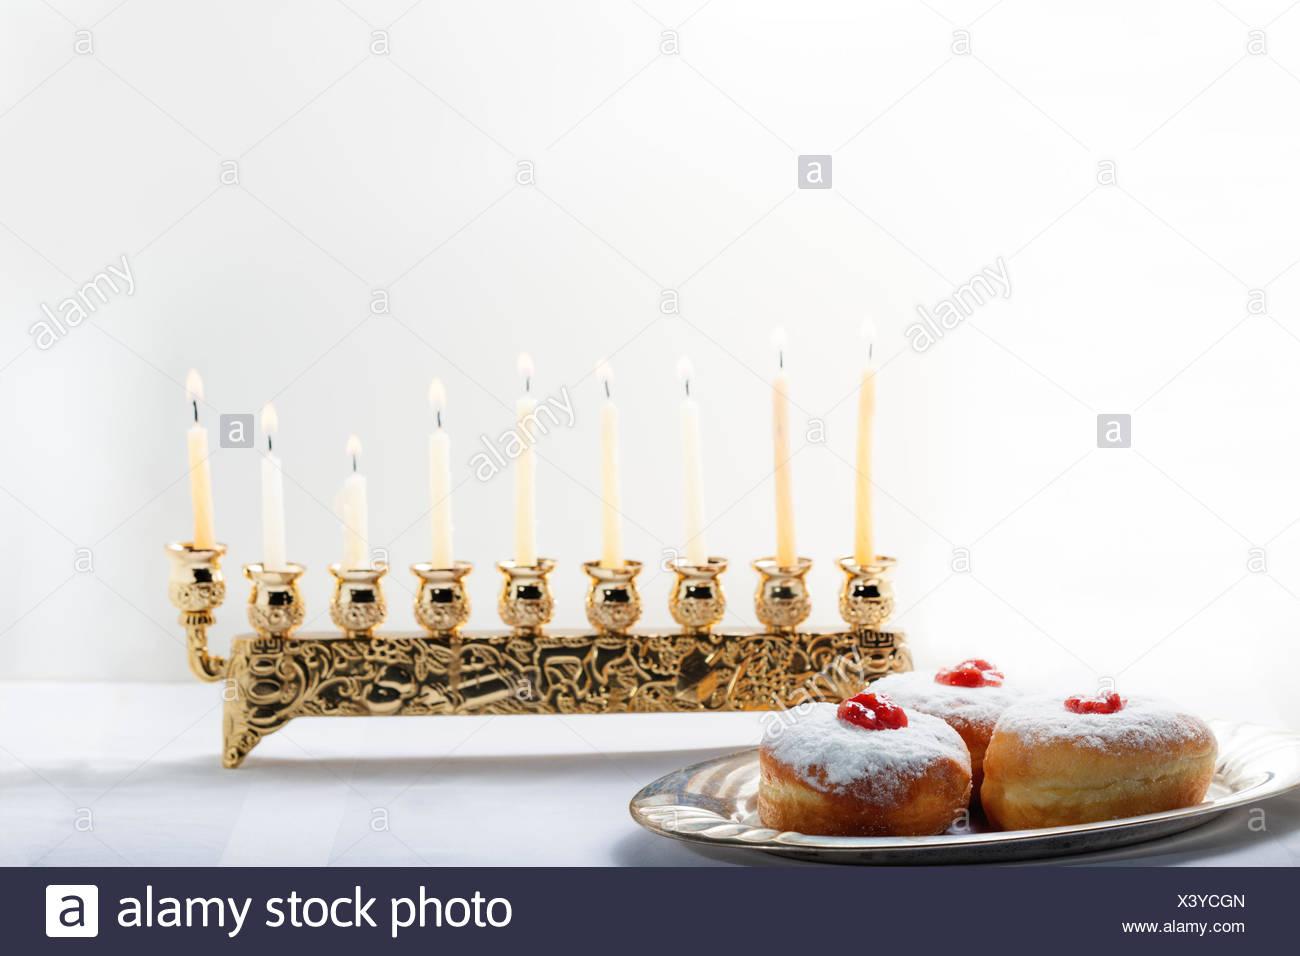 Sufganiyot for Hanukkah - Stock Image